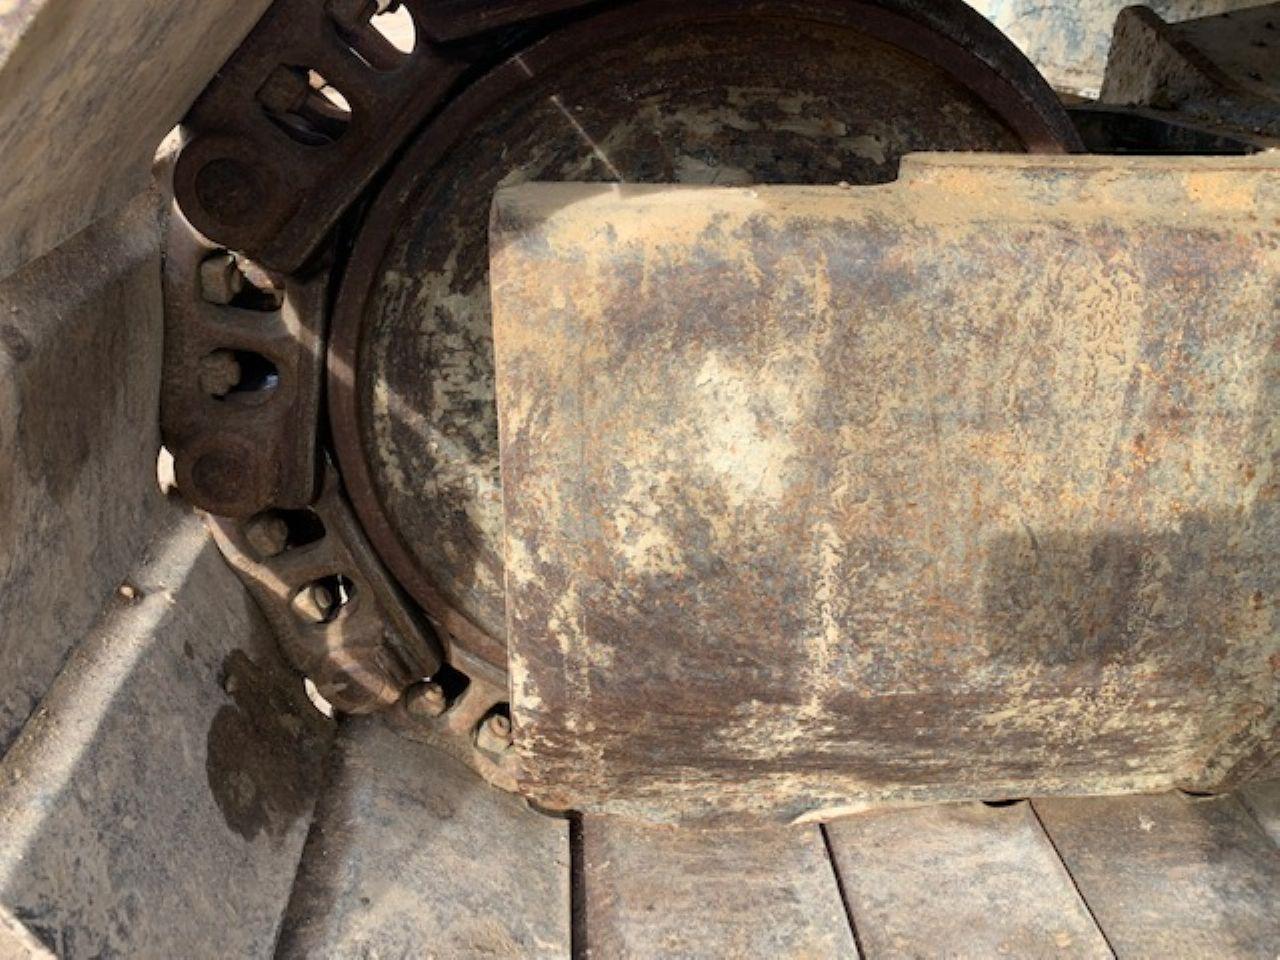 HYUNDAI ROBEX140-9A EXCAVATOR - Picture 6